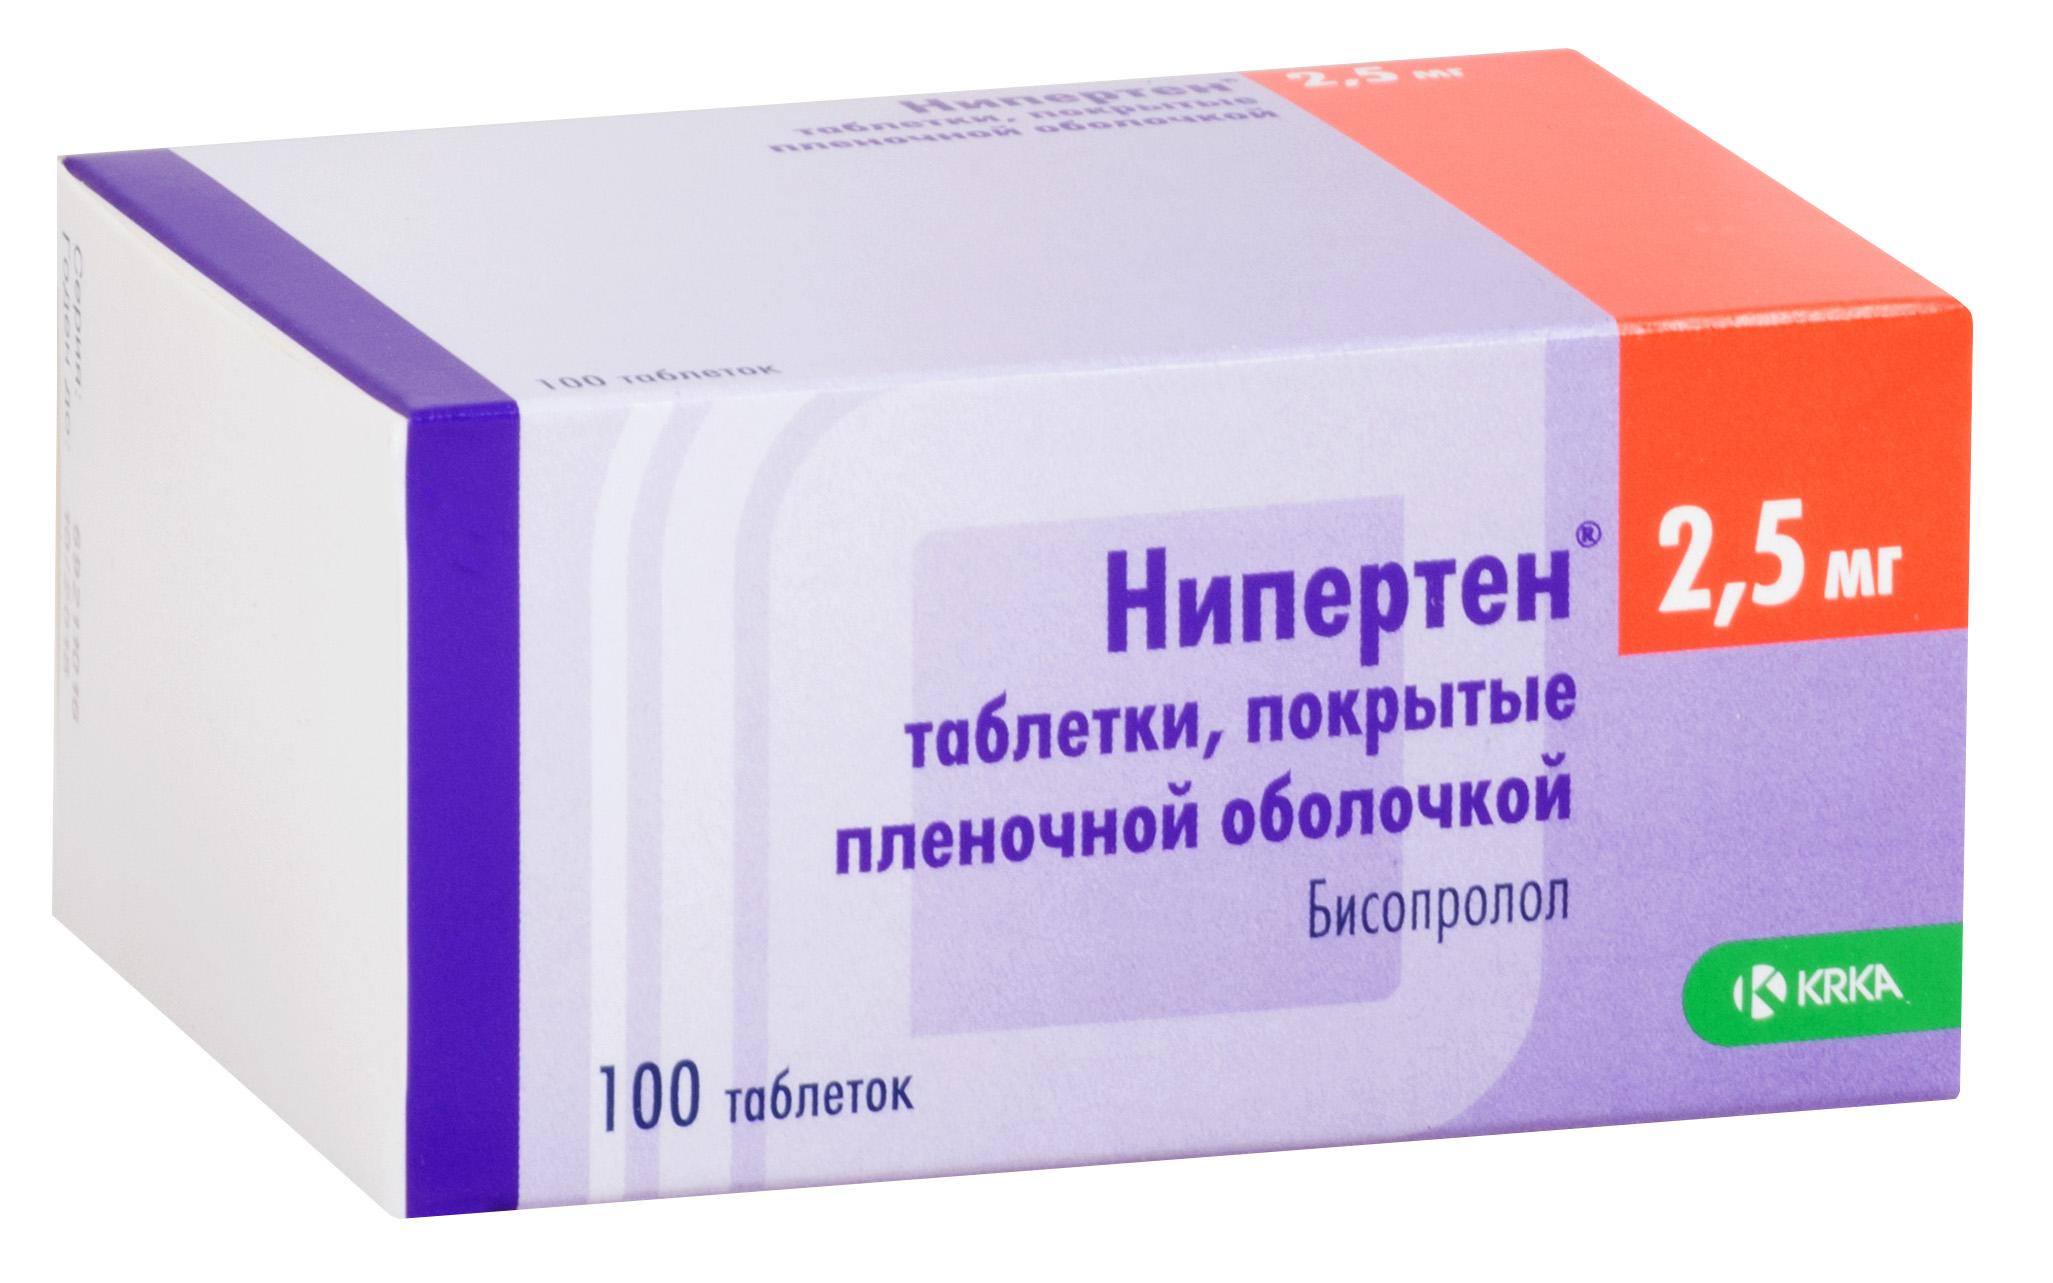 Нипертен таб. п.п.о. 2,5мг n100